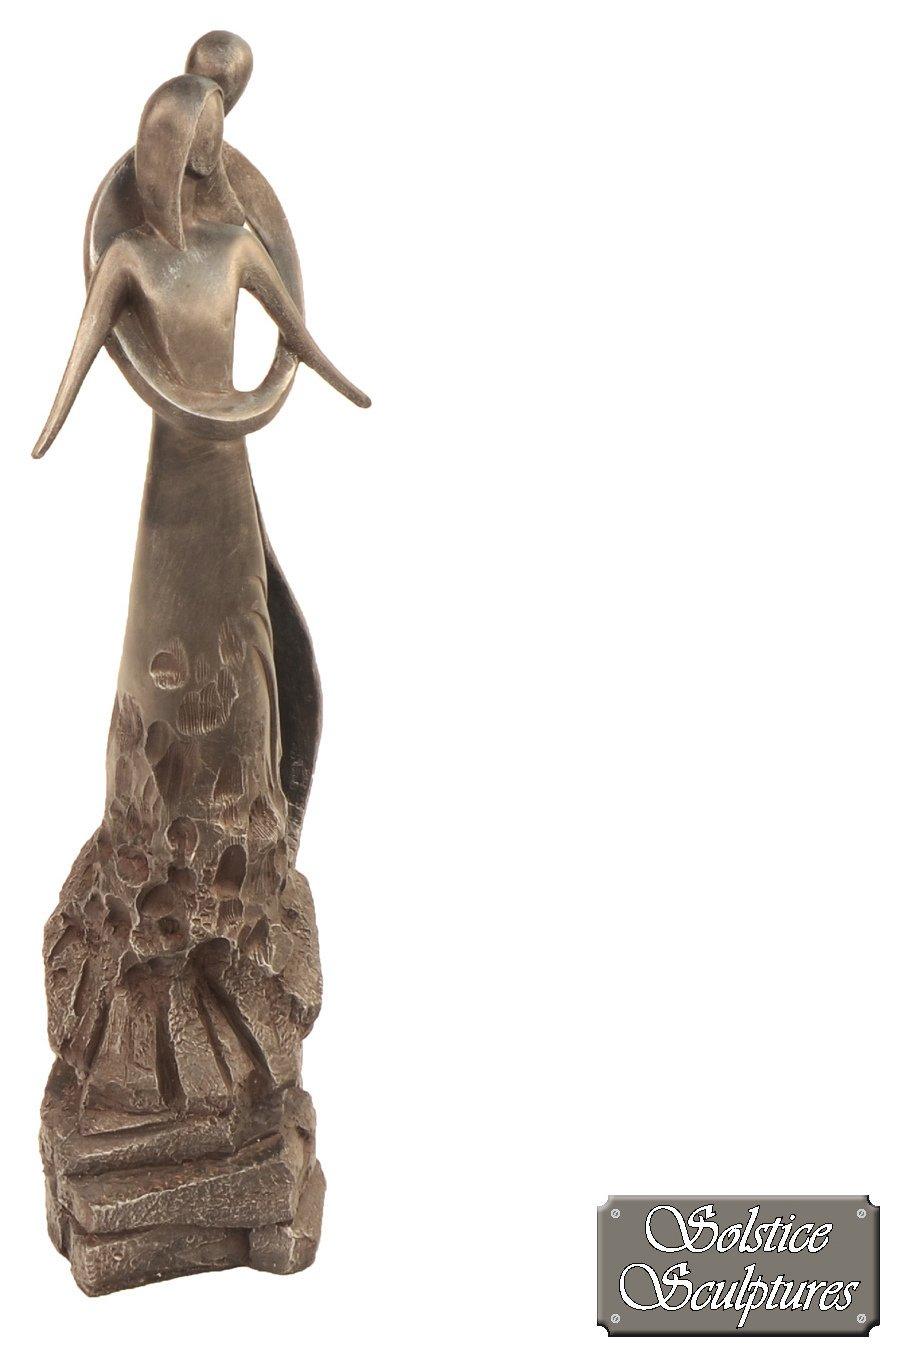 Solstice Sculptures - Embrace Lead Effect - Garden Sculpture lowest price